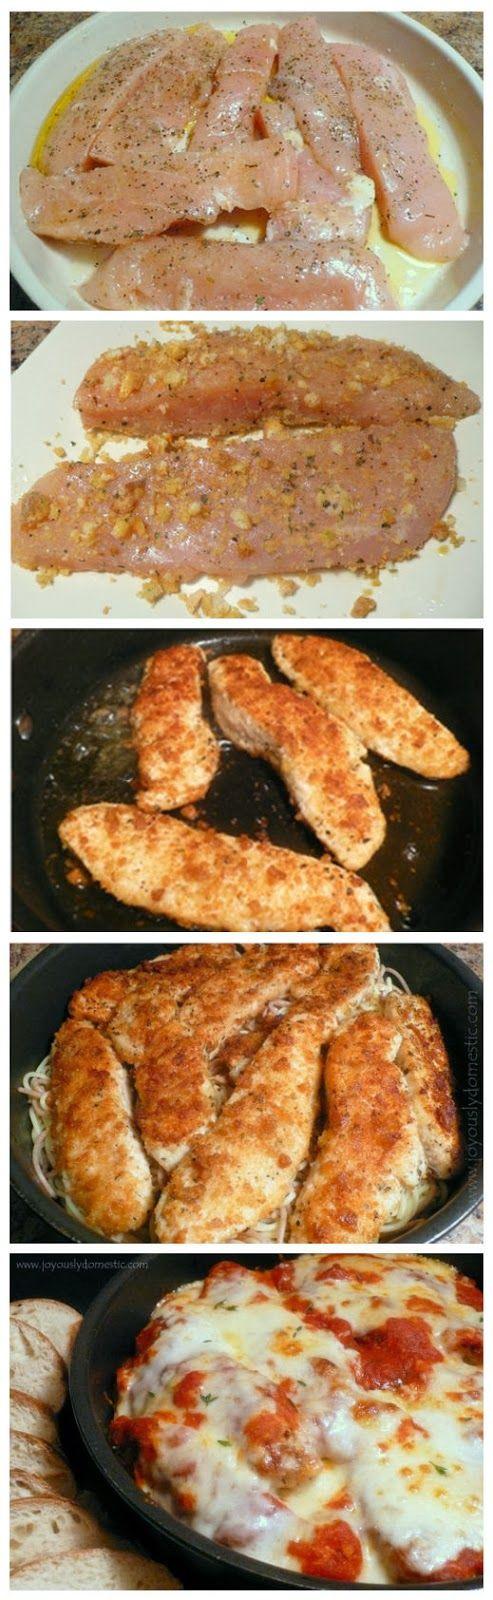 Filipin usulü tavuk (chicken adobo) tarifi